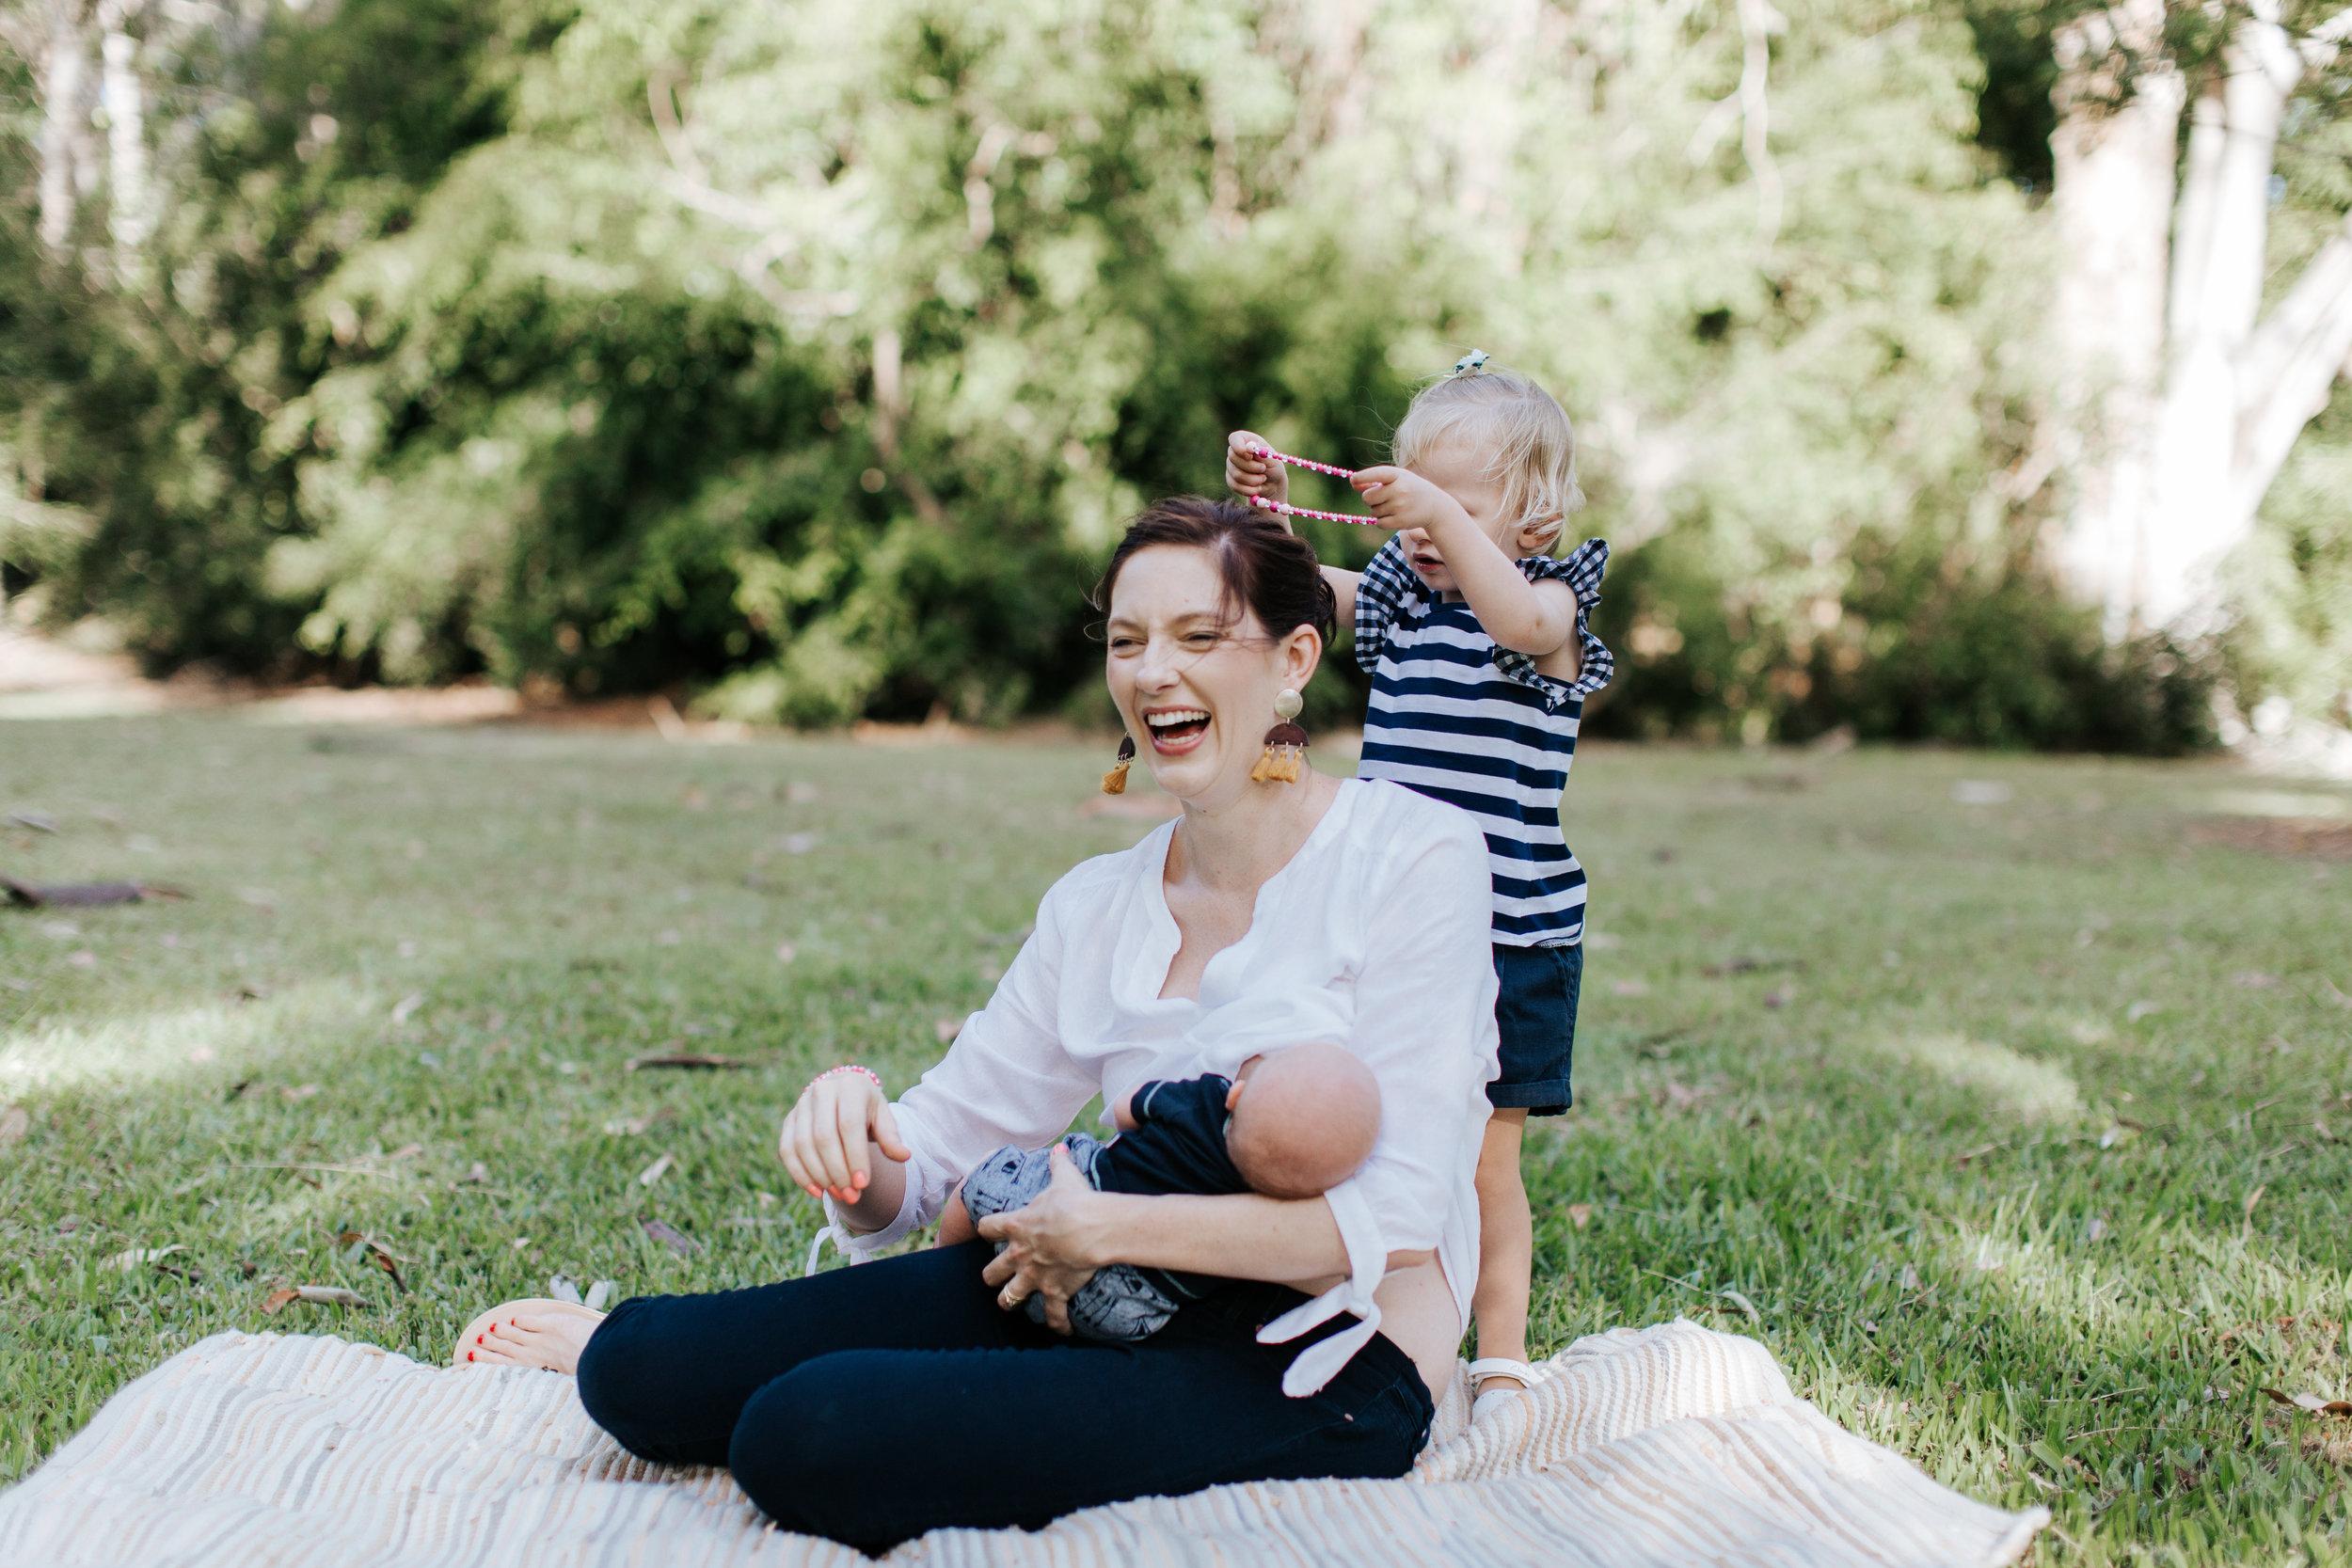 Brisbane family photographer kym renay.cullen.fam 005.jpg